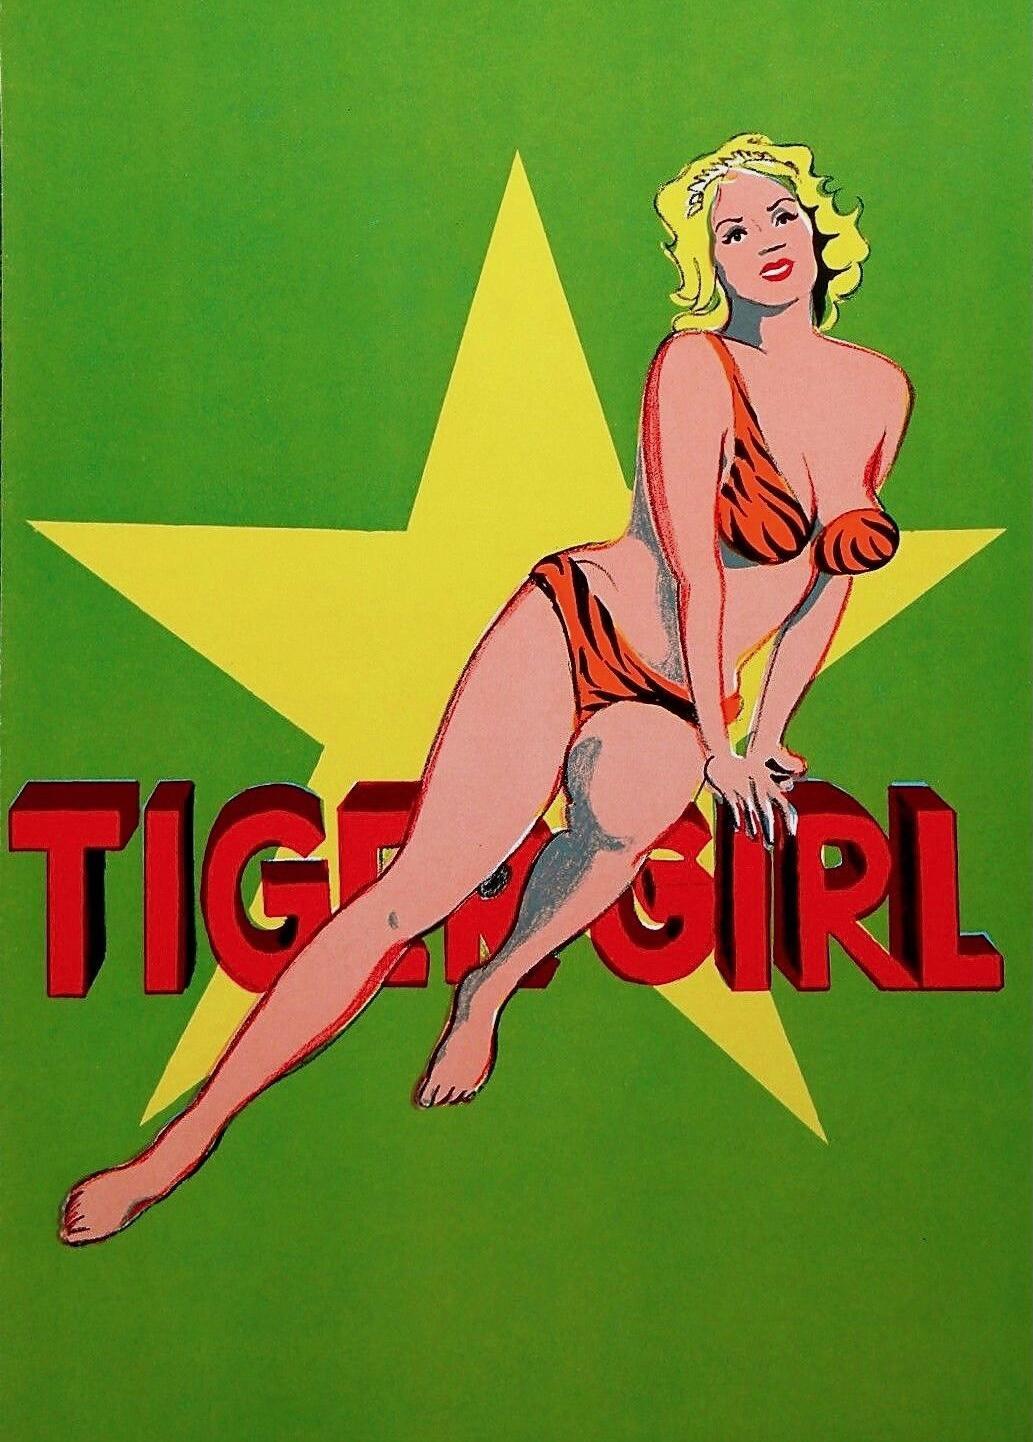 Tiger Girl, 1964 Limited Edition Lithograph, Mel Ramos